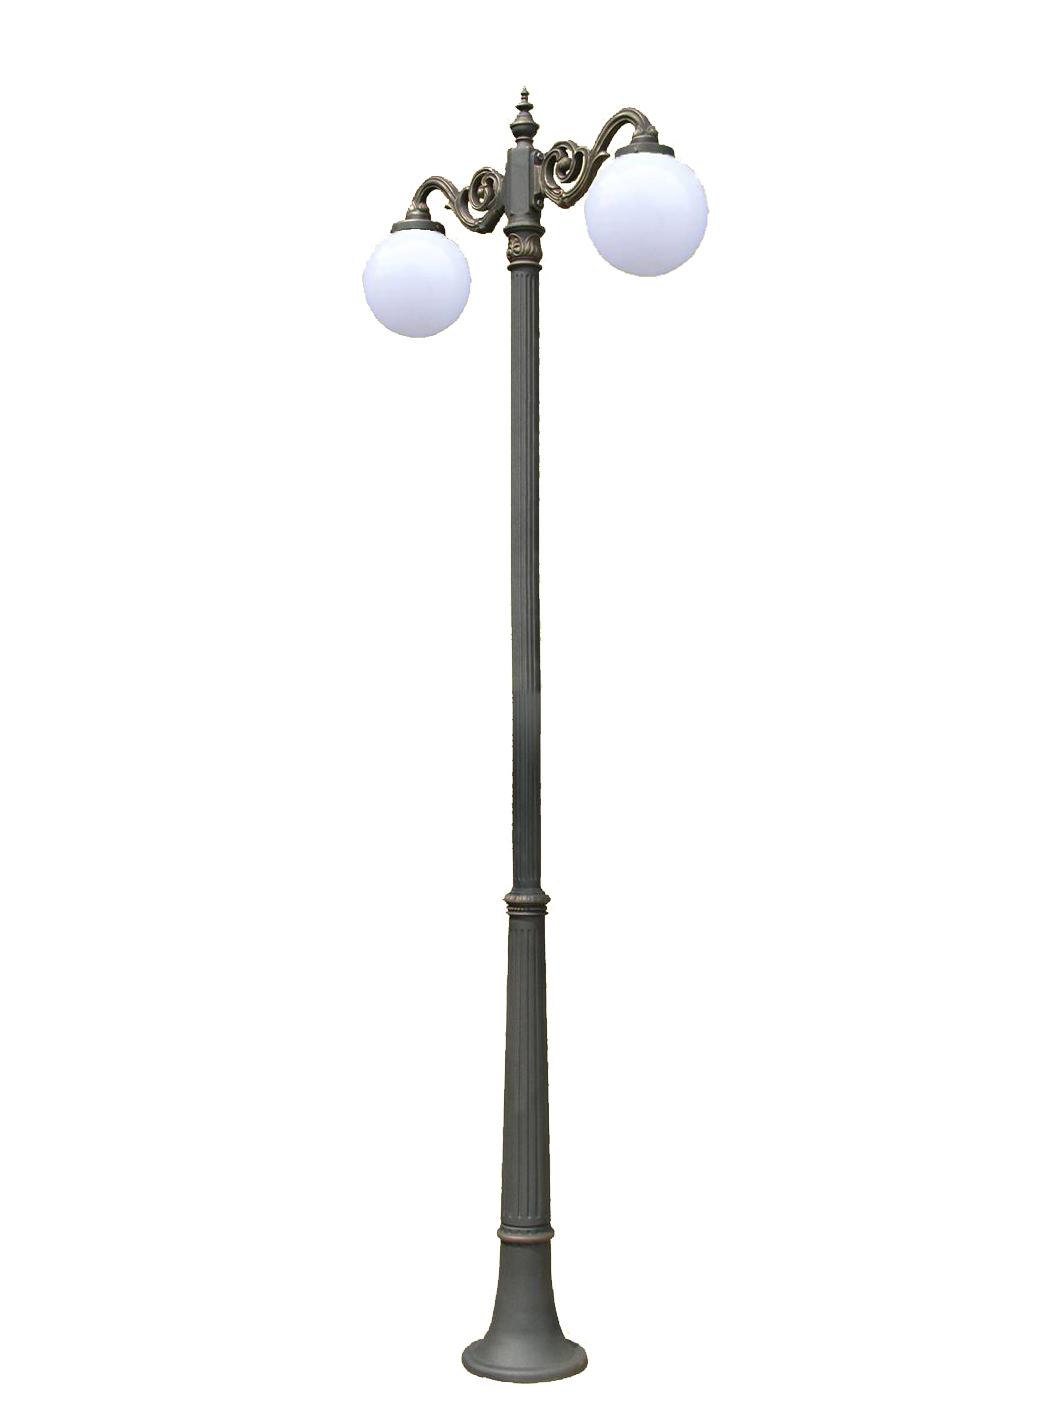 Stalpi ornamentali pentru iluminat stradal, parcuri, gradini BRAMAL LIGHT - Poza 22